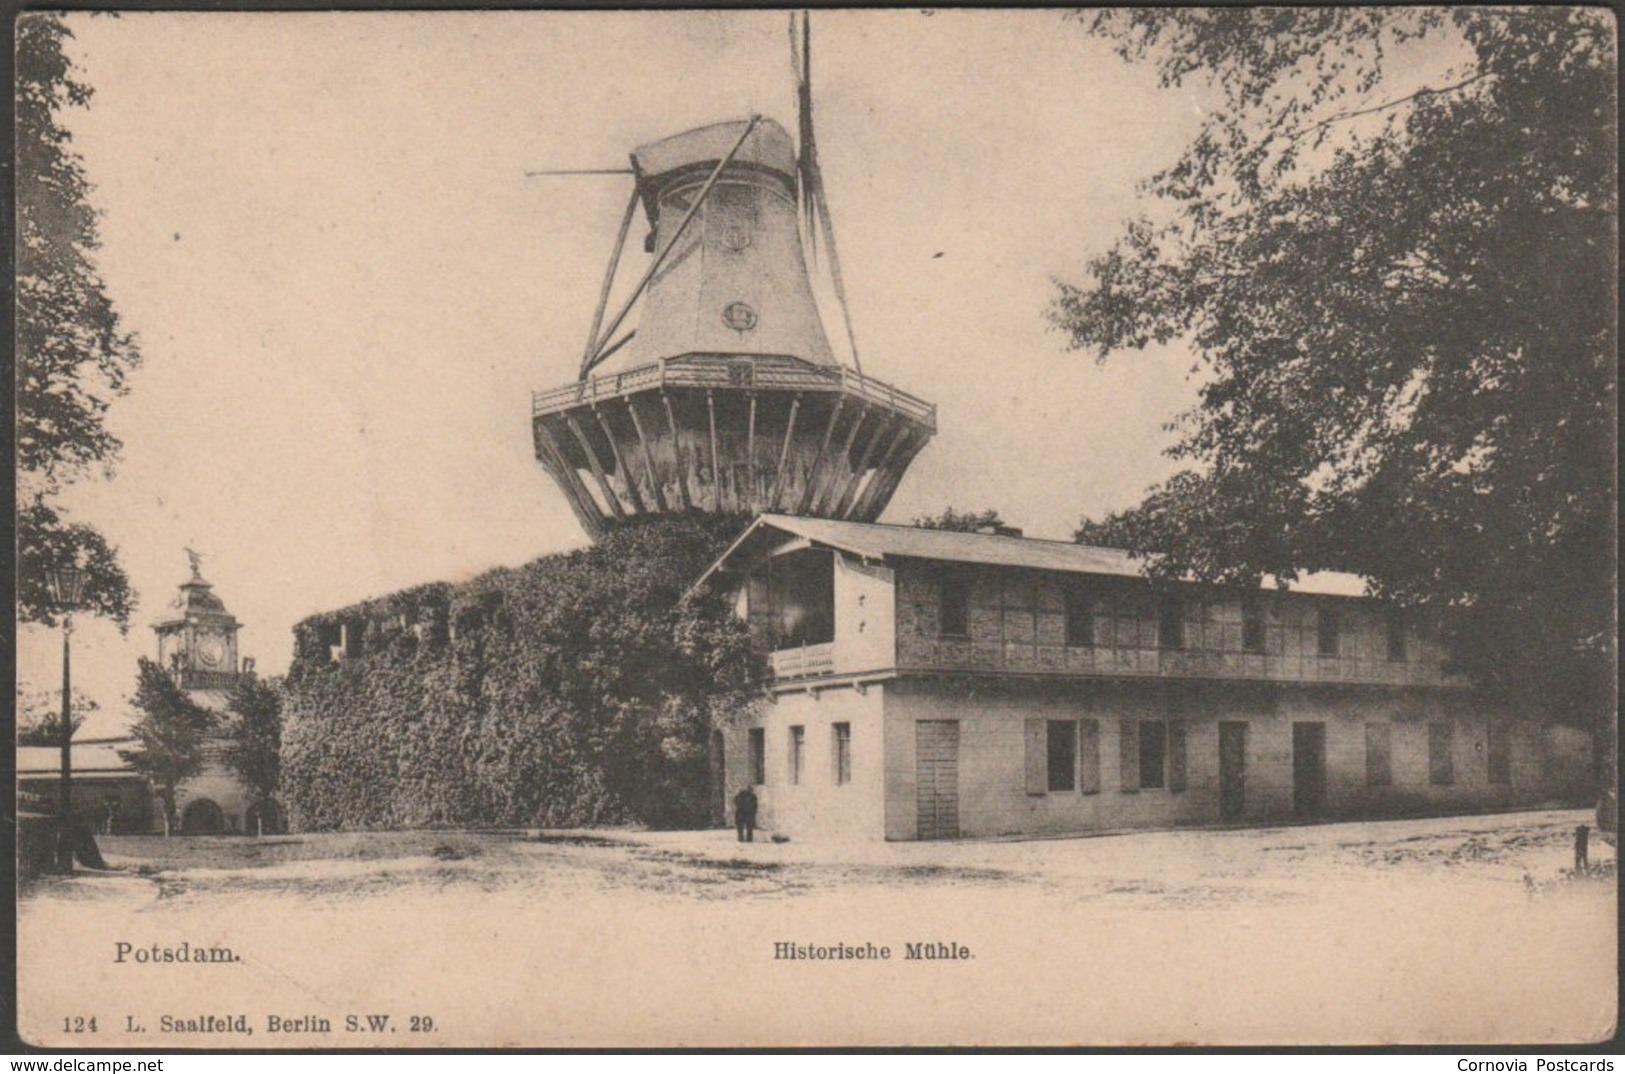 Historische Mühle, Potsdam, Brandenburg, C.1905 - Saalfeld U/B AK - Potsdam